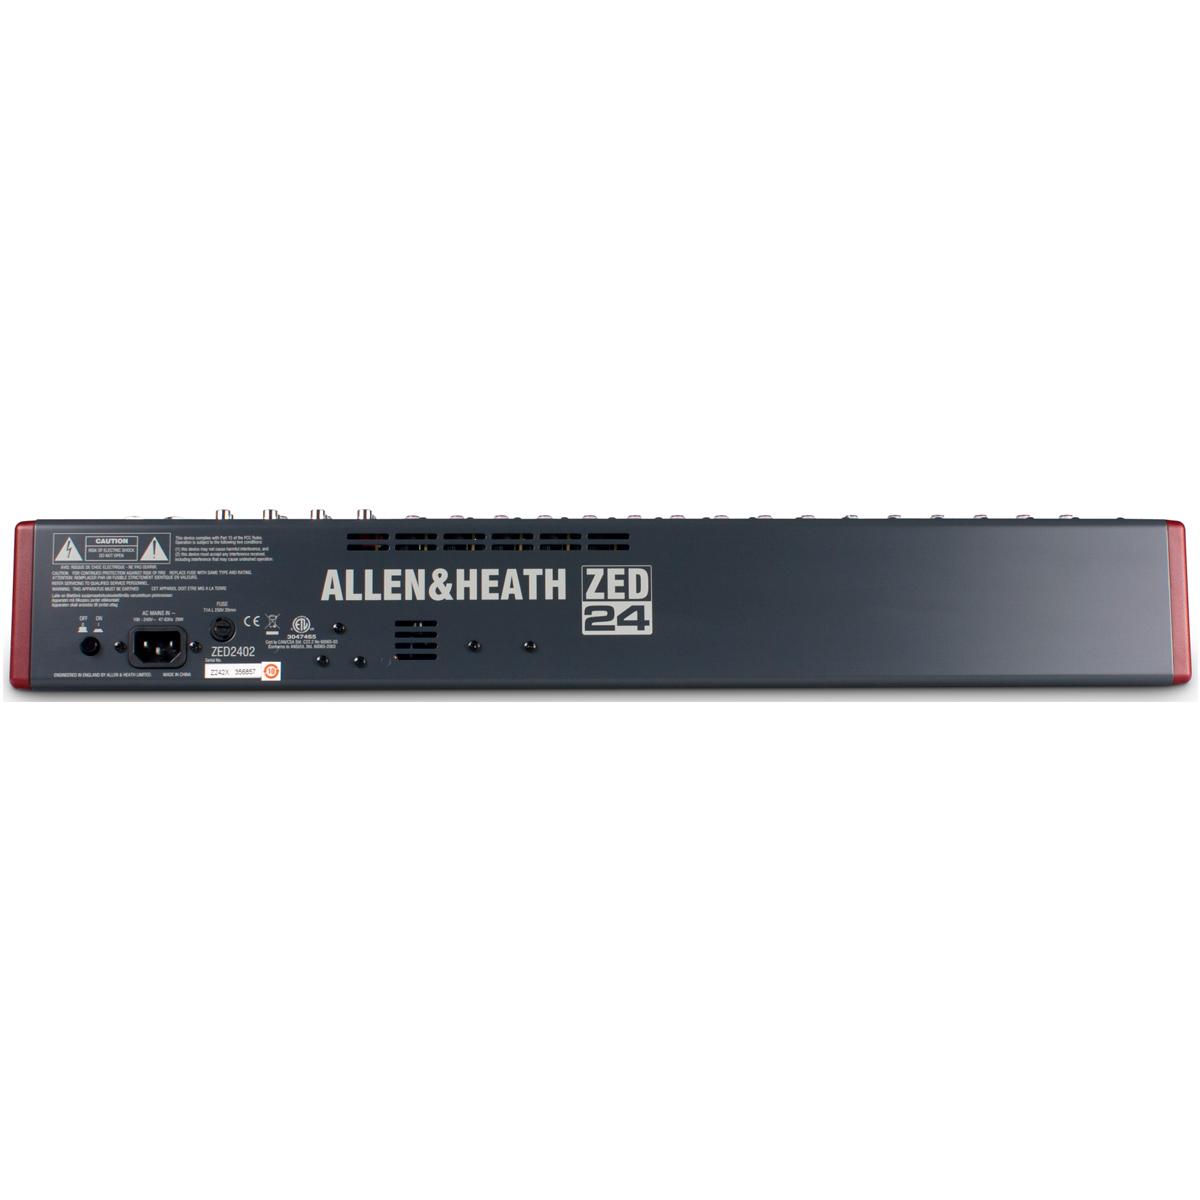 Mesa de Som 24 Canais Balanceados (16 XLR + 8 P10) c/ USB / 4 Auxiliares - ZED 24 Allen Heath